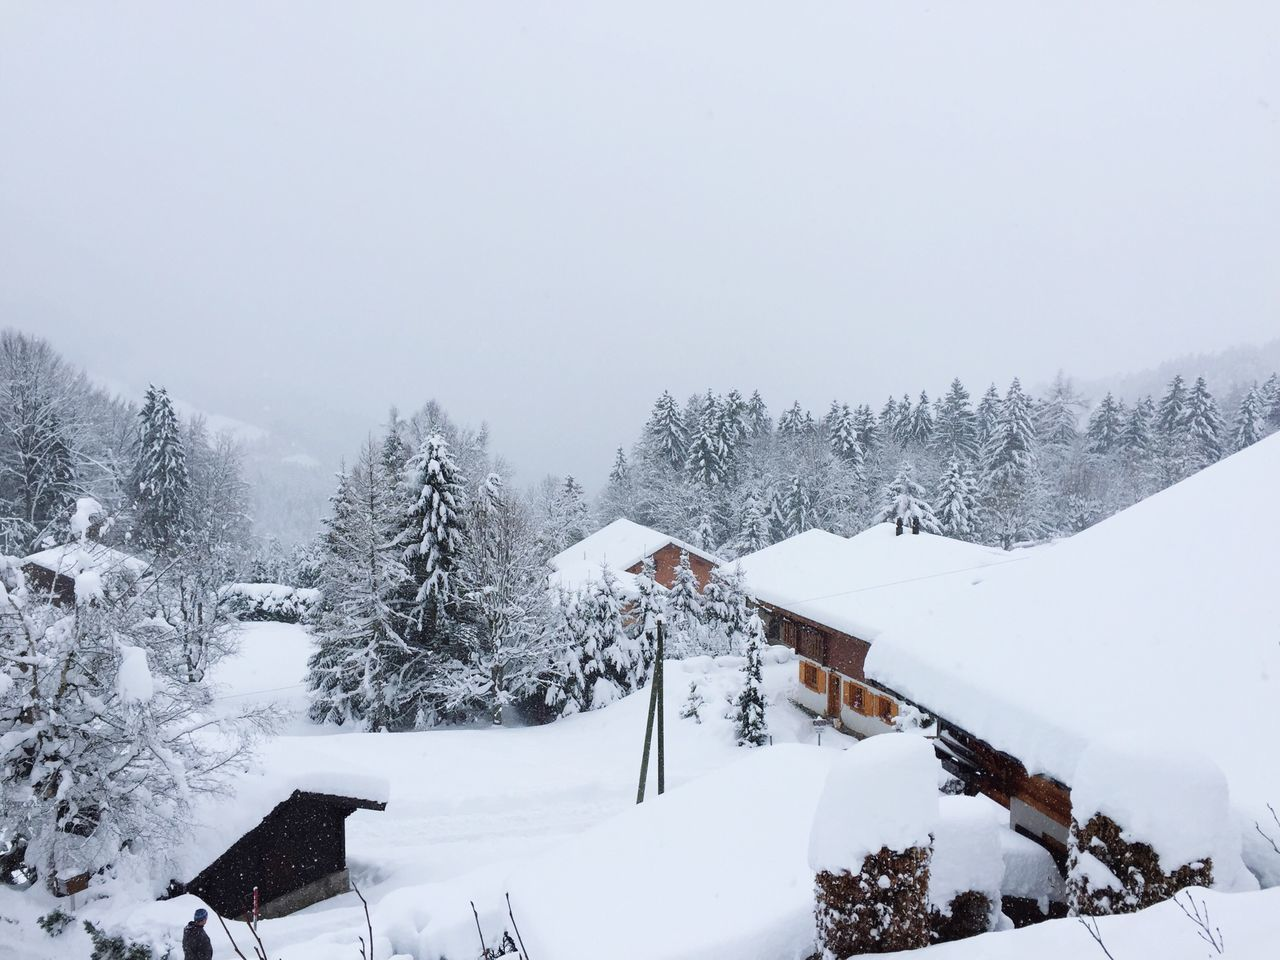 Snow Switzerland Enjoying The View ❄️